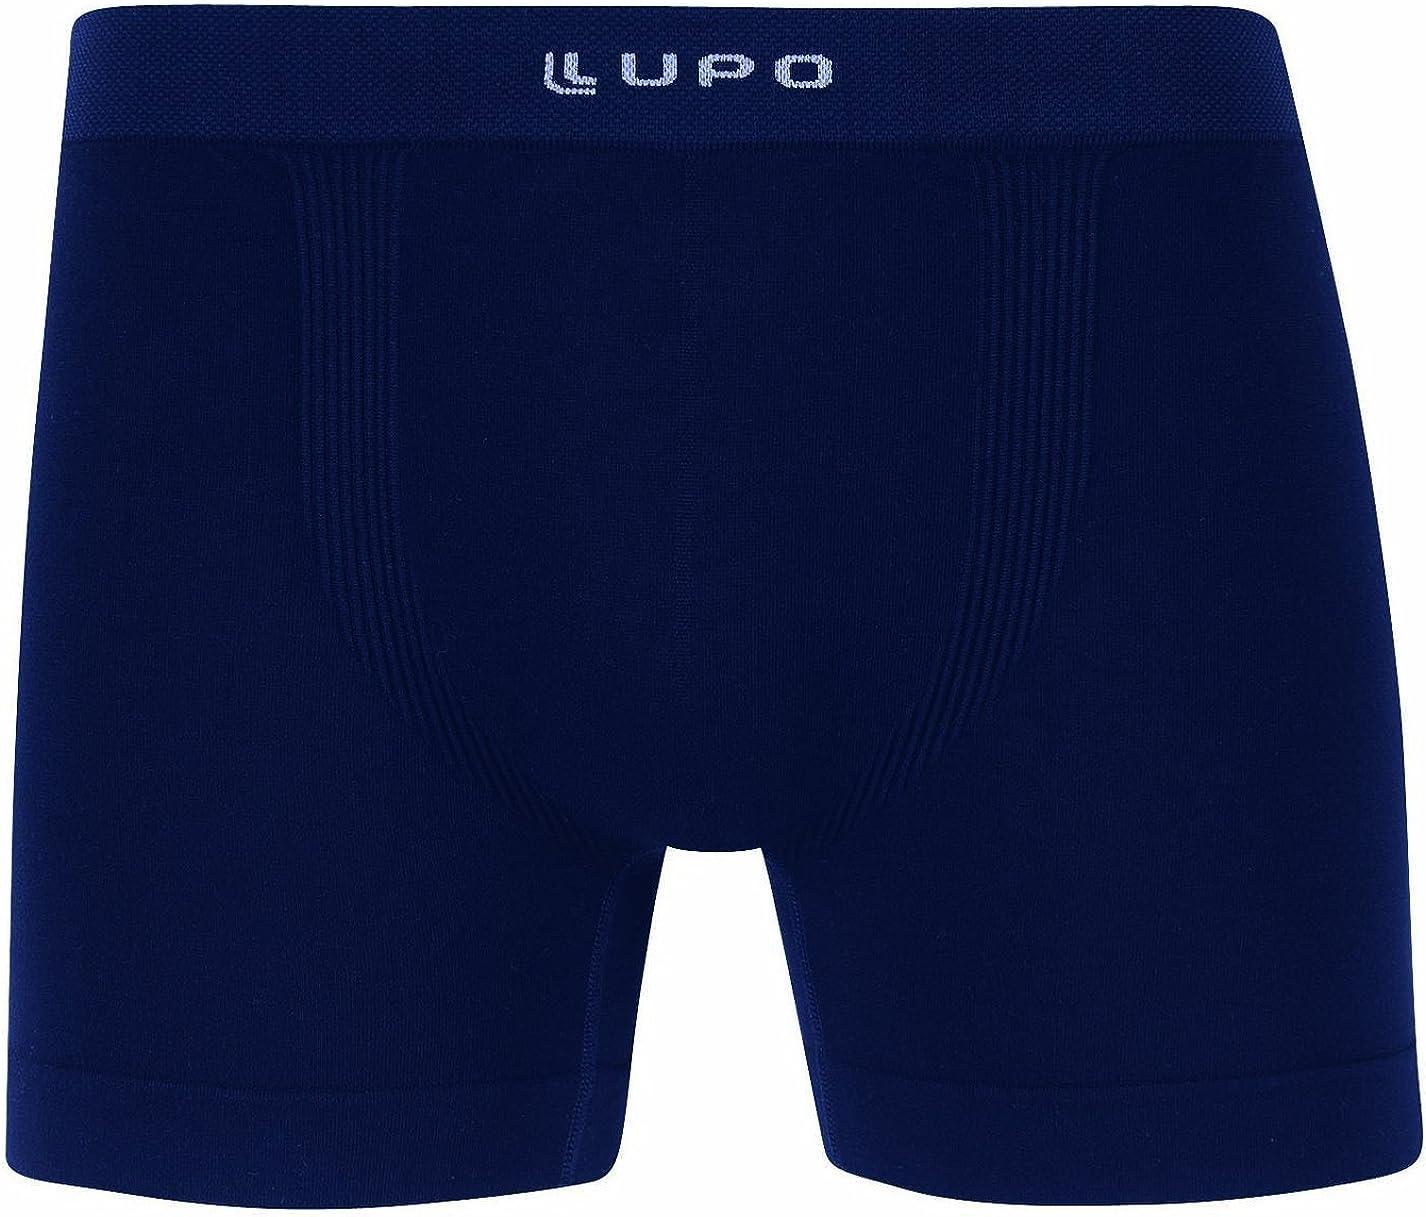 Lupo Men's Micro Modal Seamless Boxer Brief Underwear